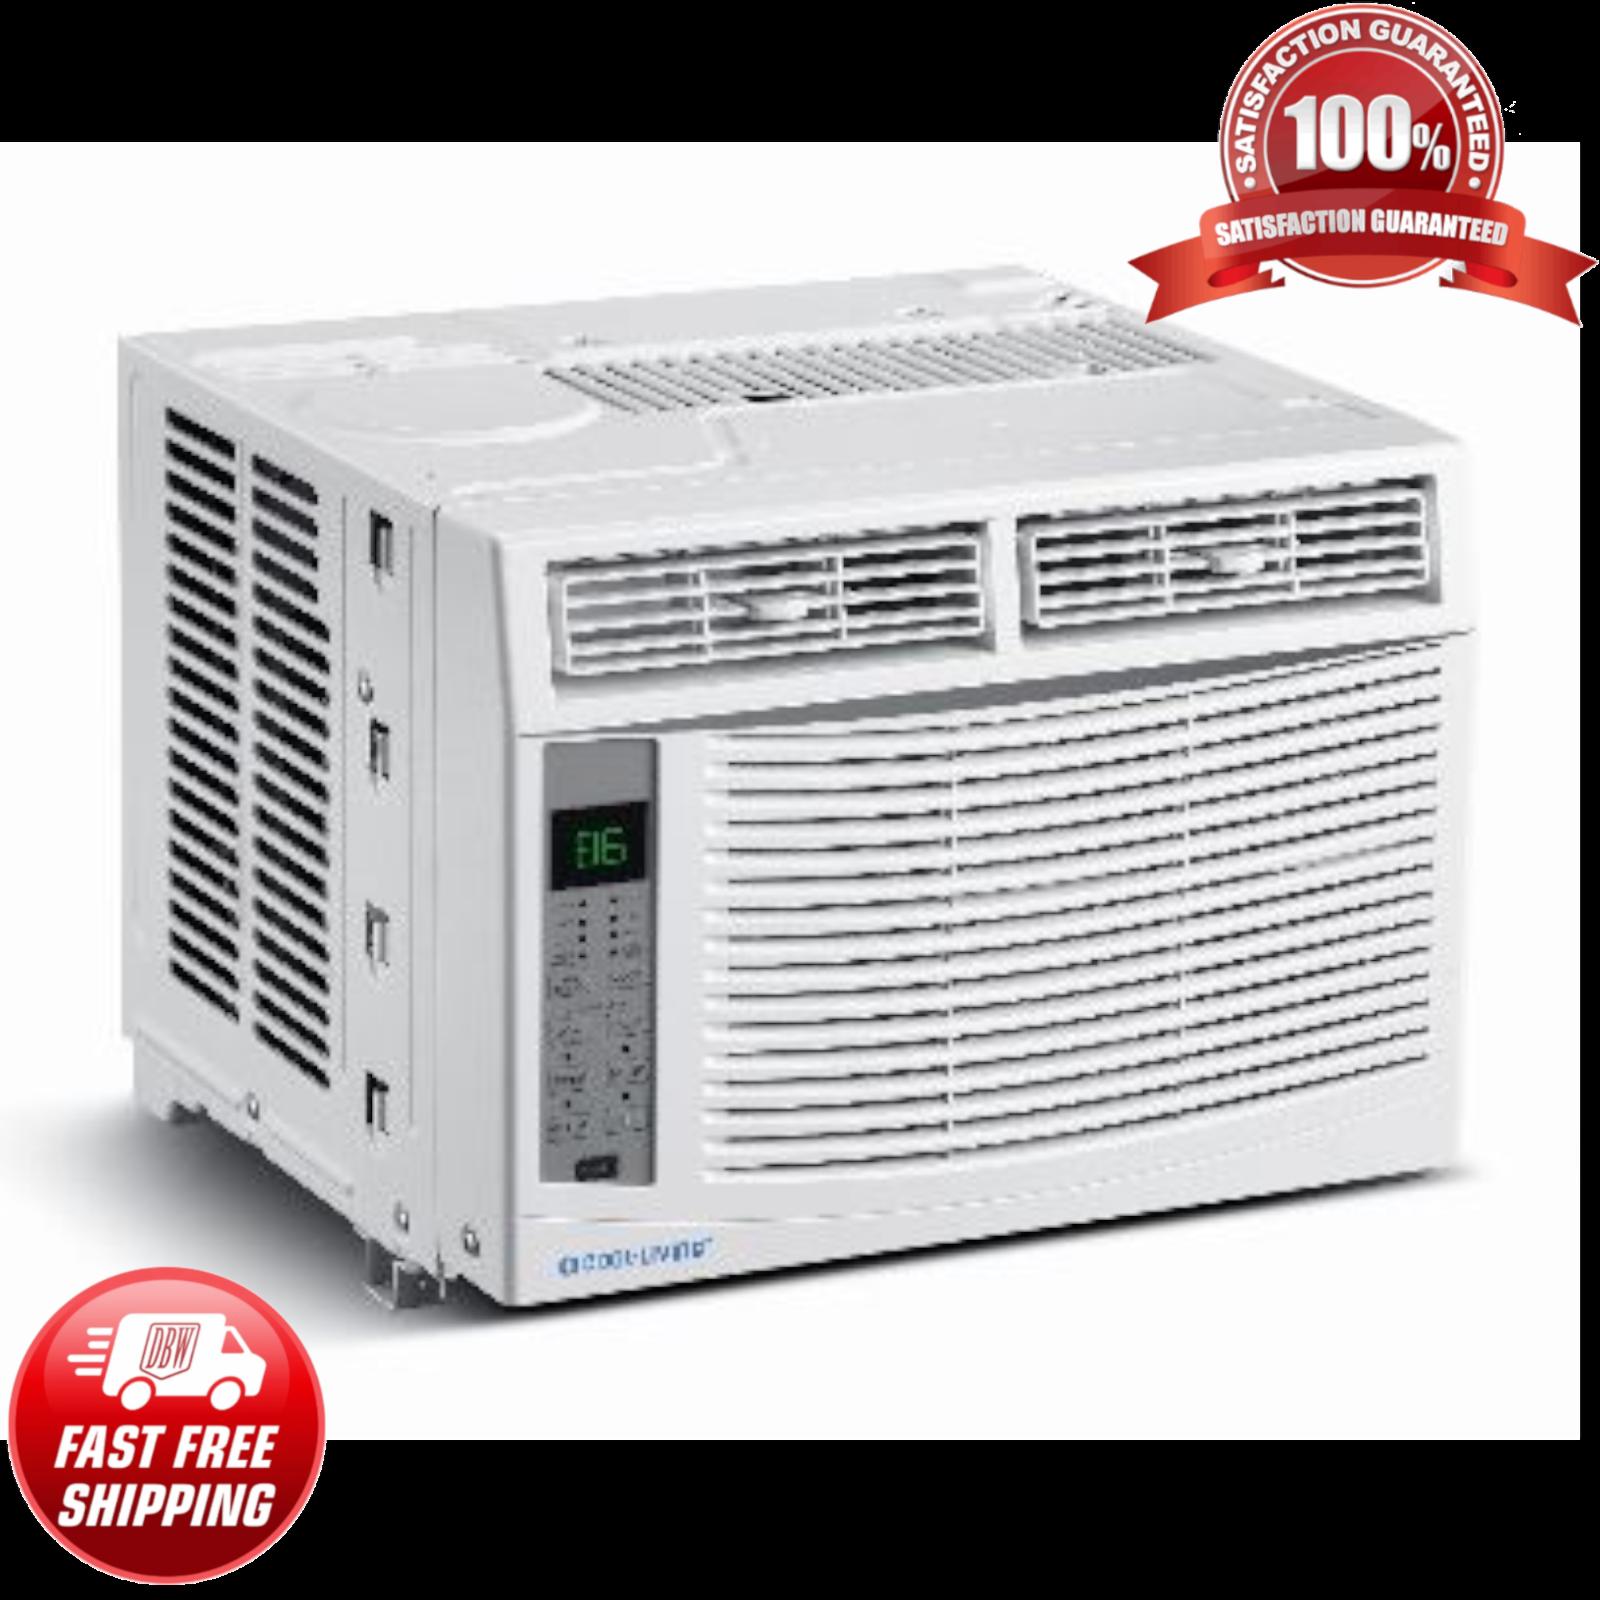 6000 BTU Compact Window Air Conditioner 350 Sq Ft Home AC Un